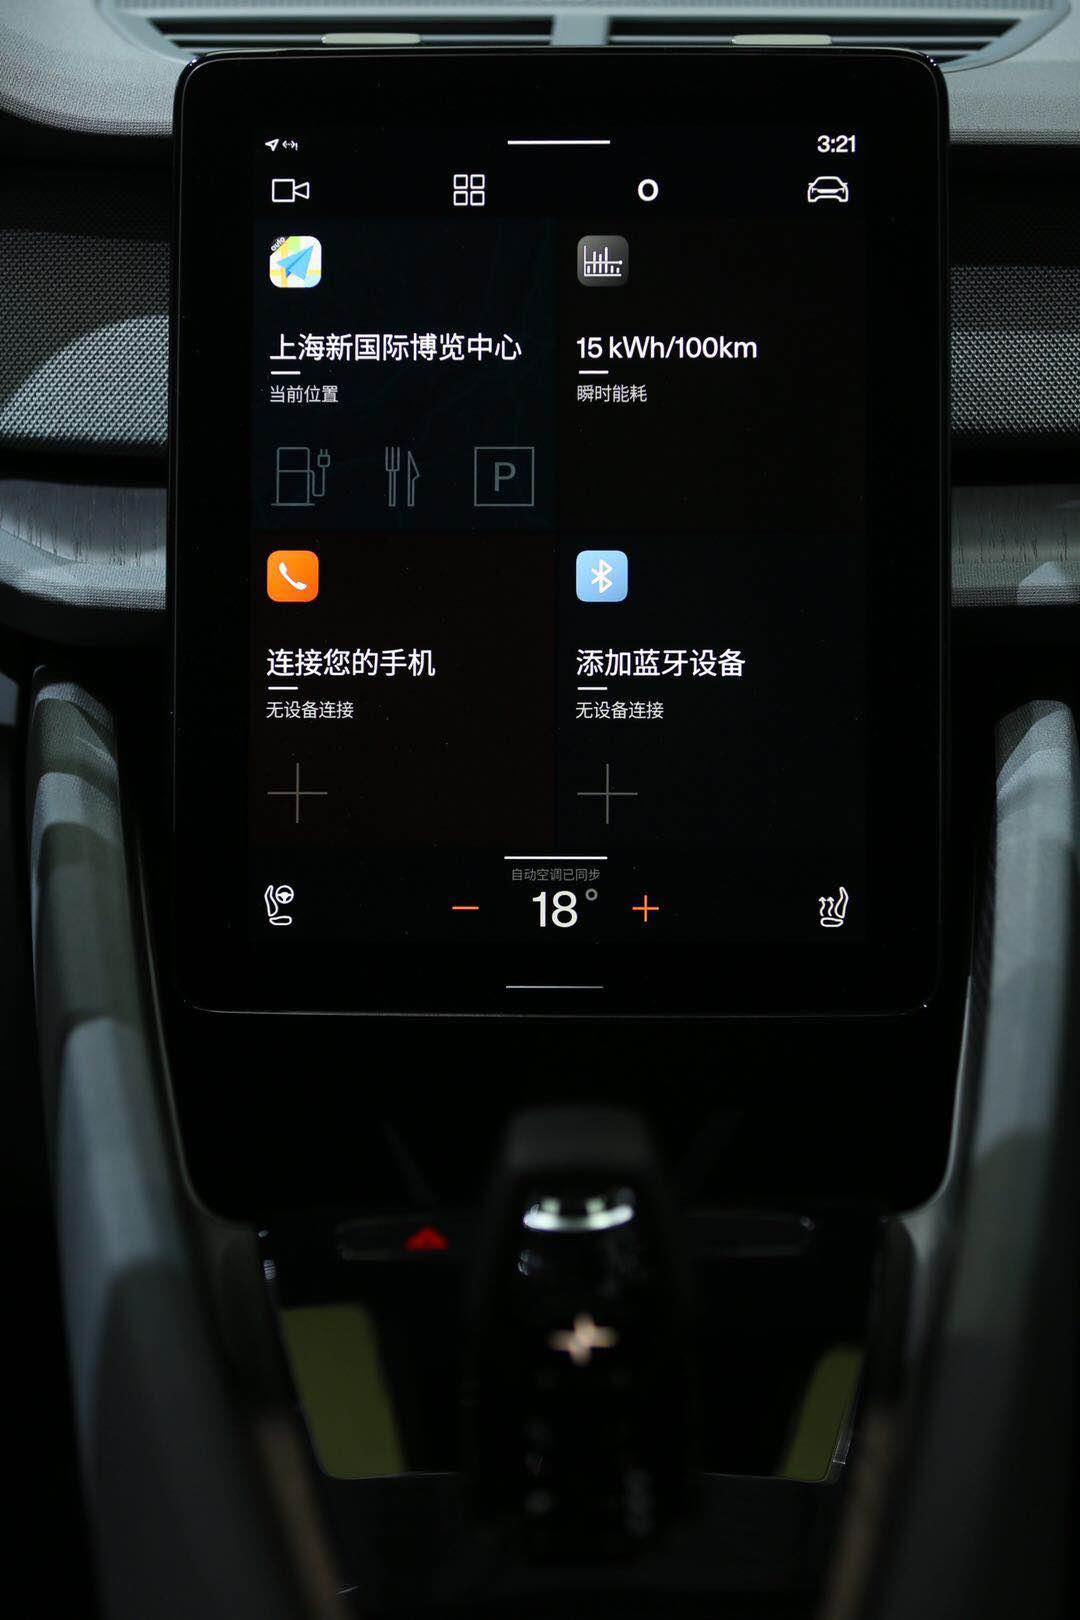 Polestar 2即将亮相深圳,继续中国巡展之旅 【图】